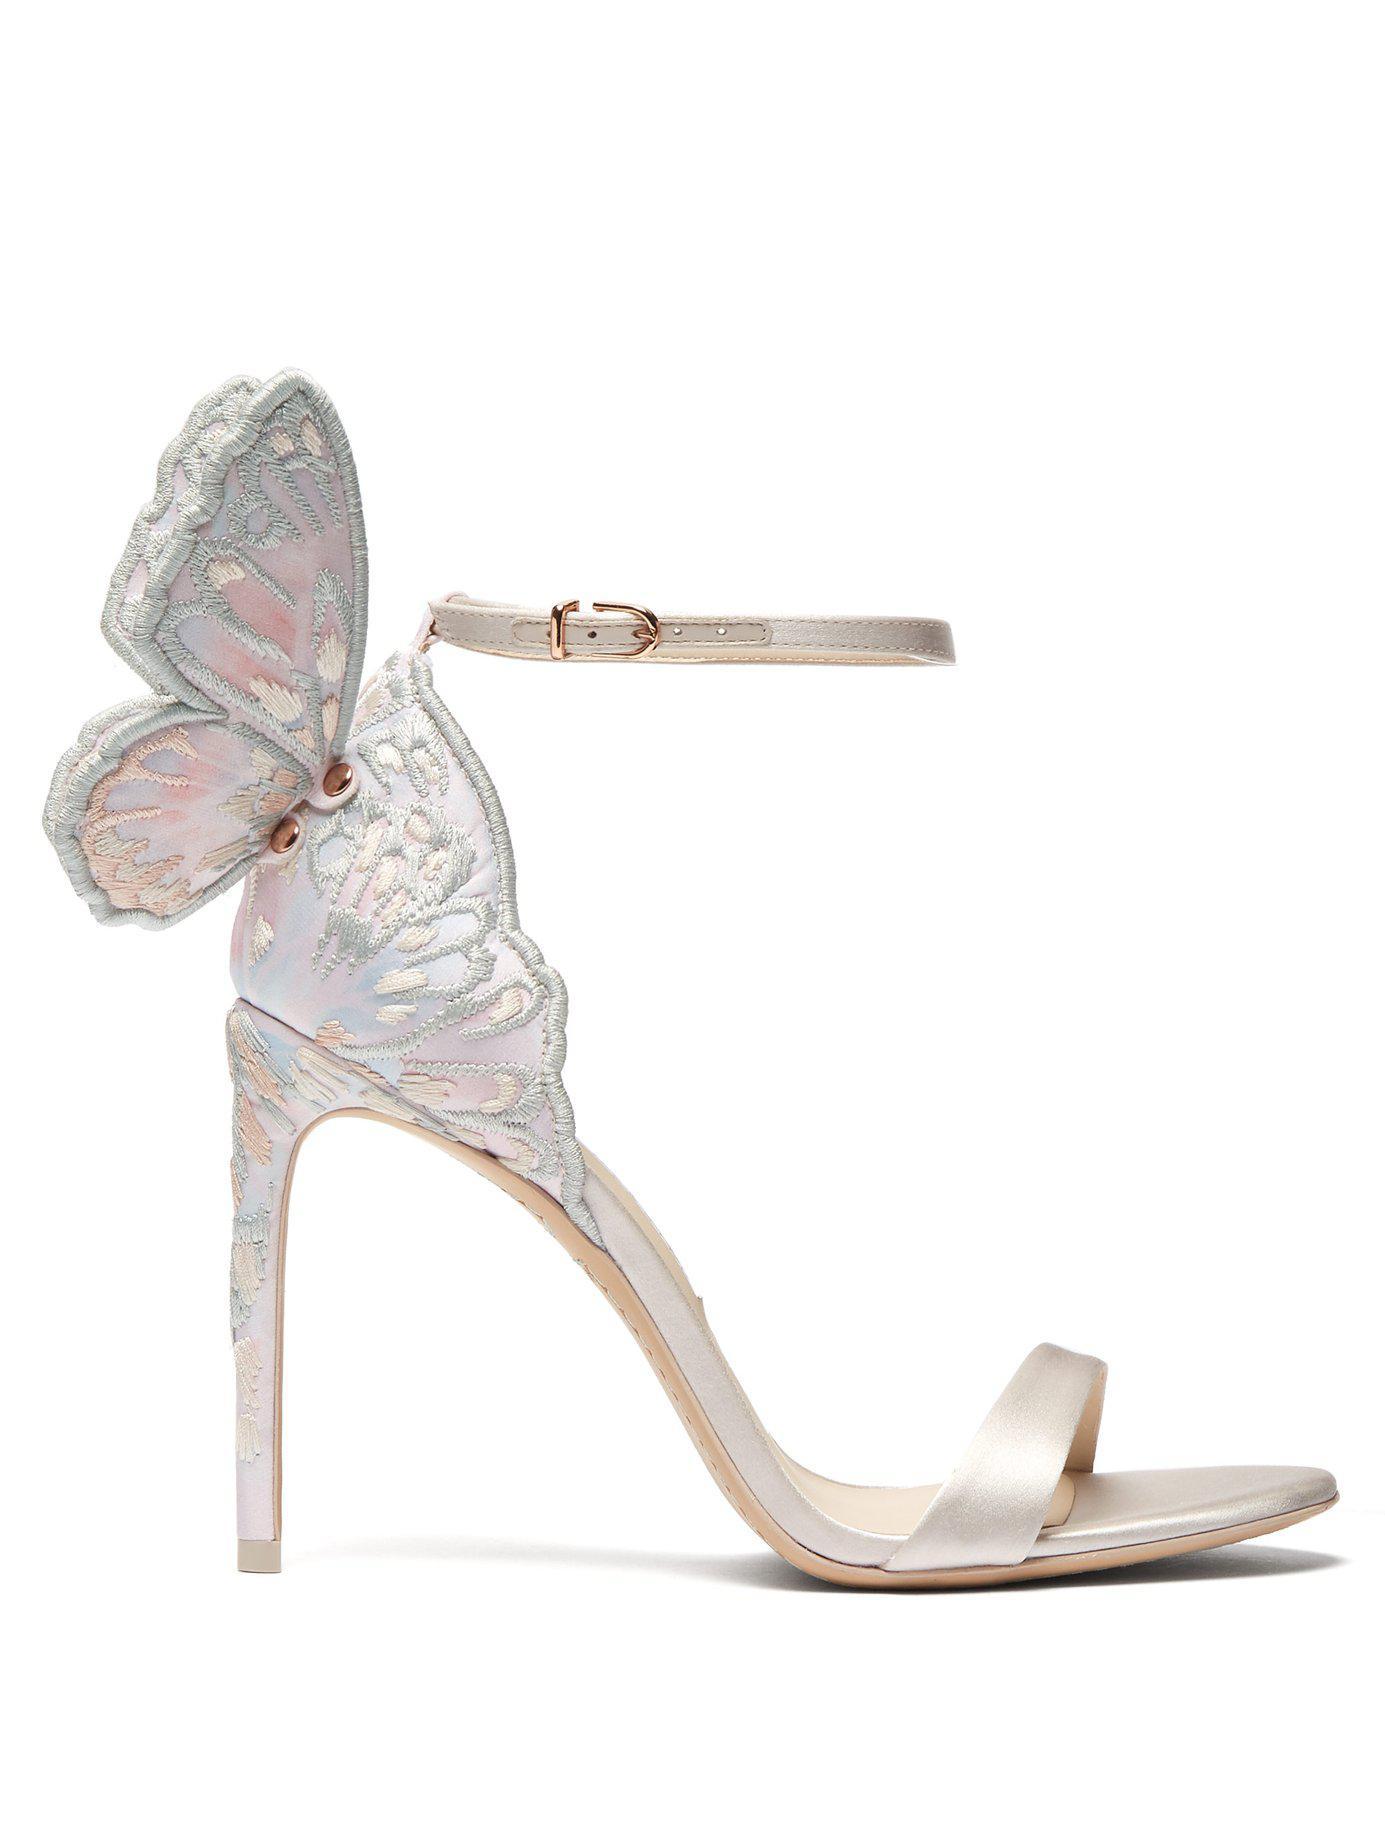 50c4e3ccbab Lyst - Sophia Webster Women s Chiara High-heel Sandals in White